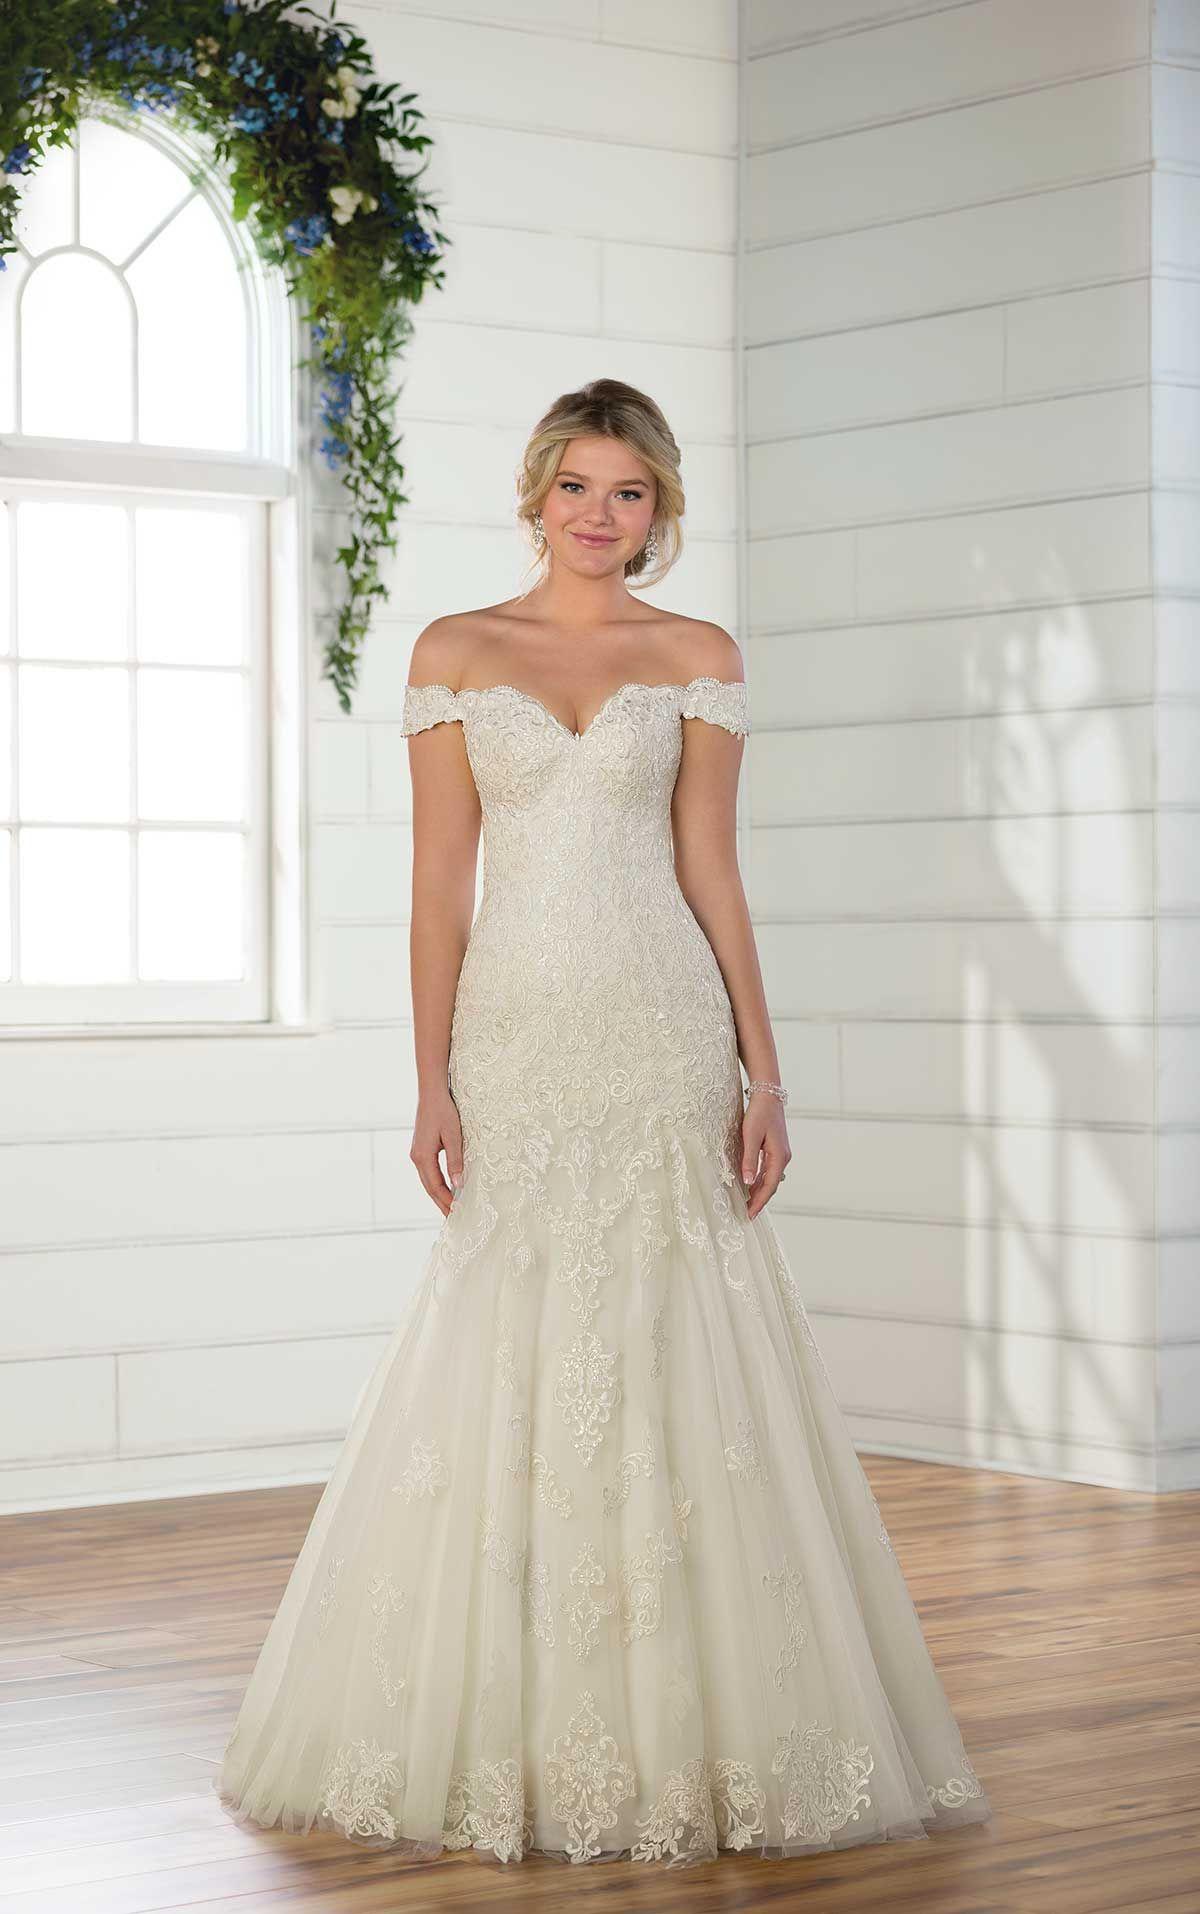 Plus Size Vintage Wedding Dresses.Plus Size Vintage Wedding Dresses Australia Lixnet Ag